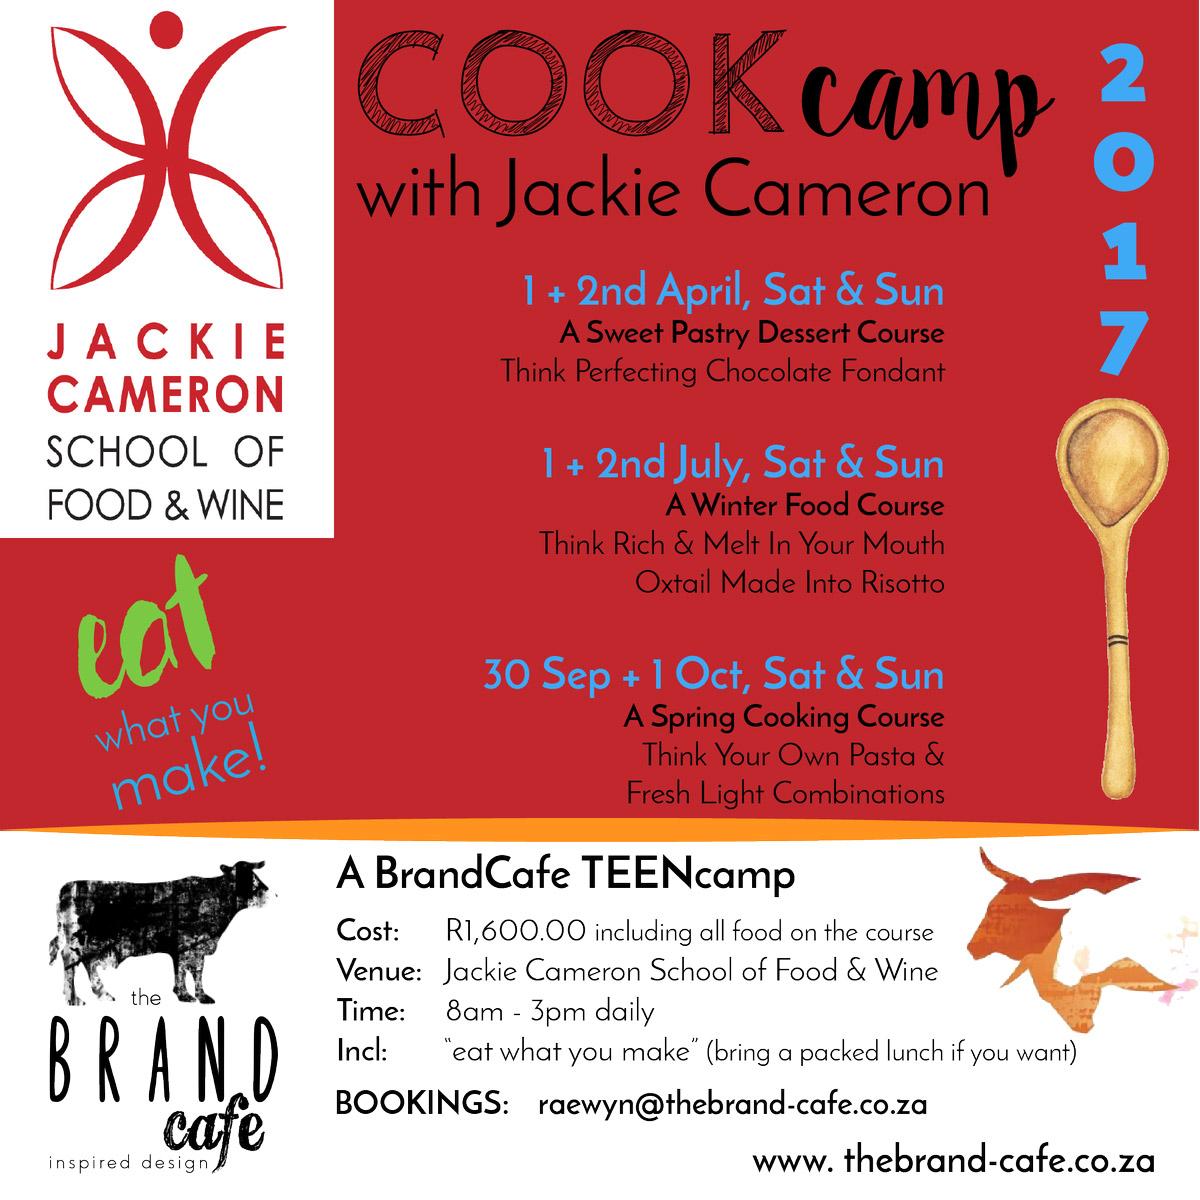 Jackie Cameron Cook Camp